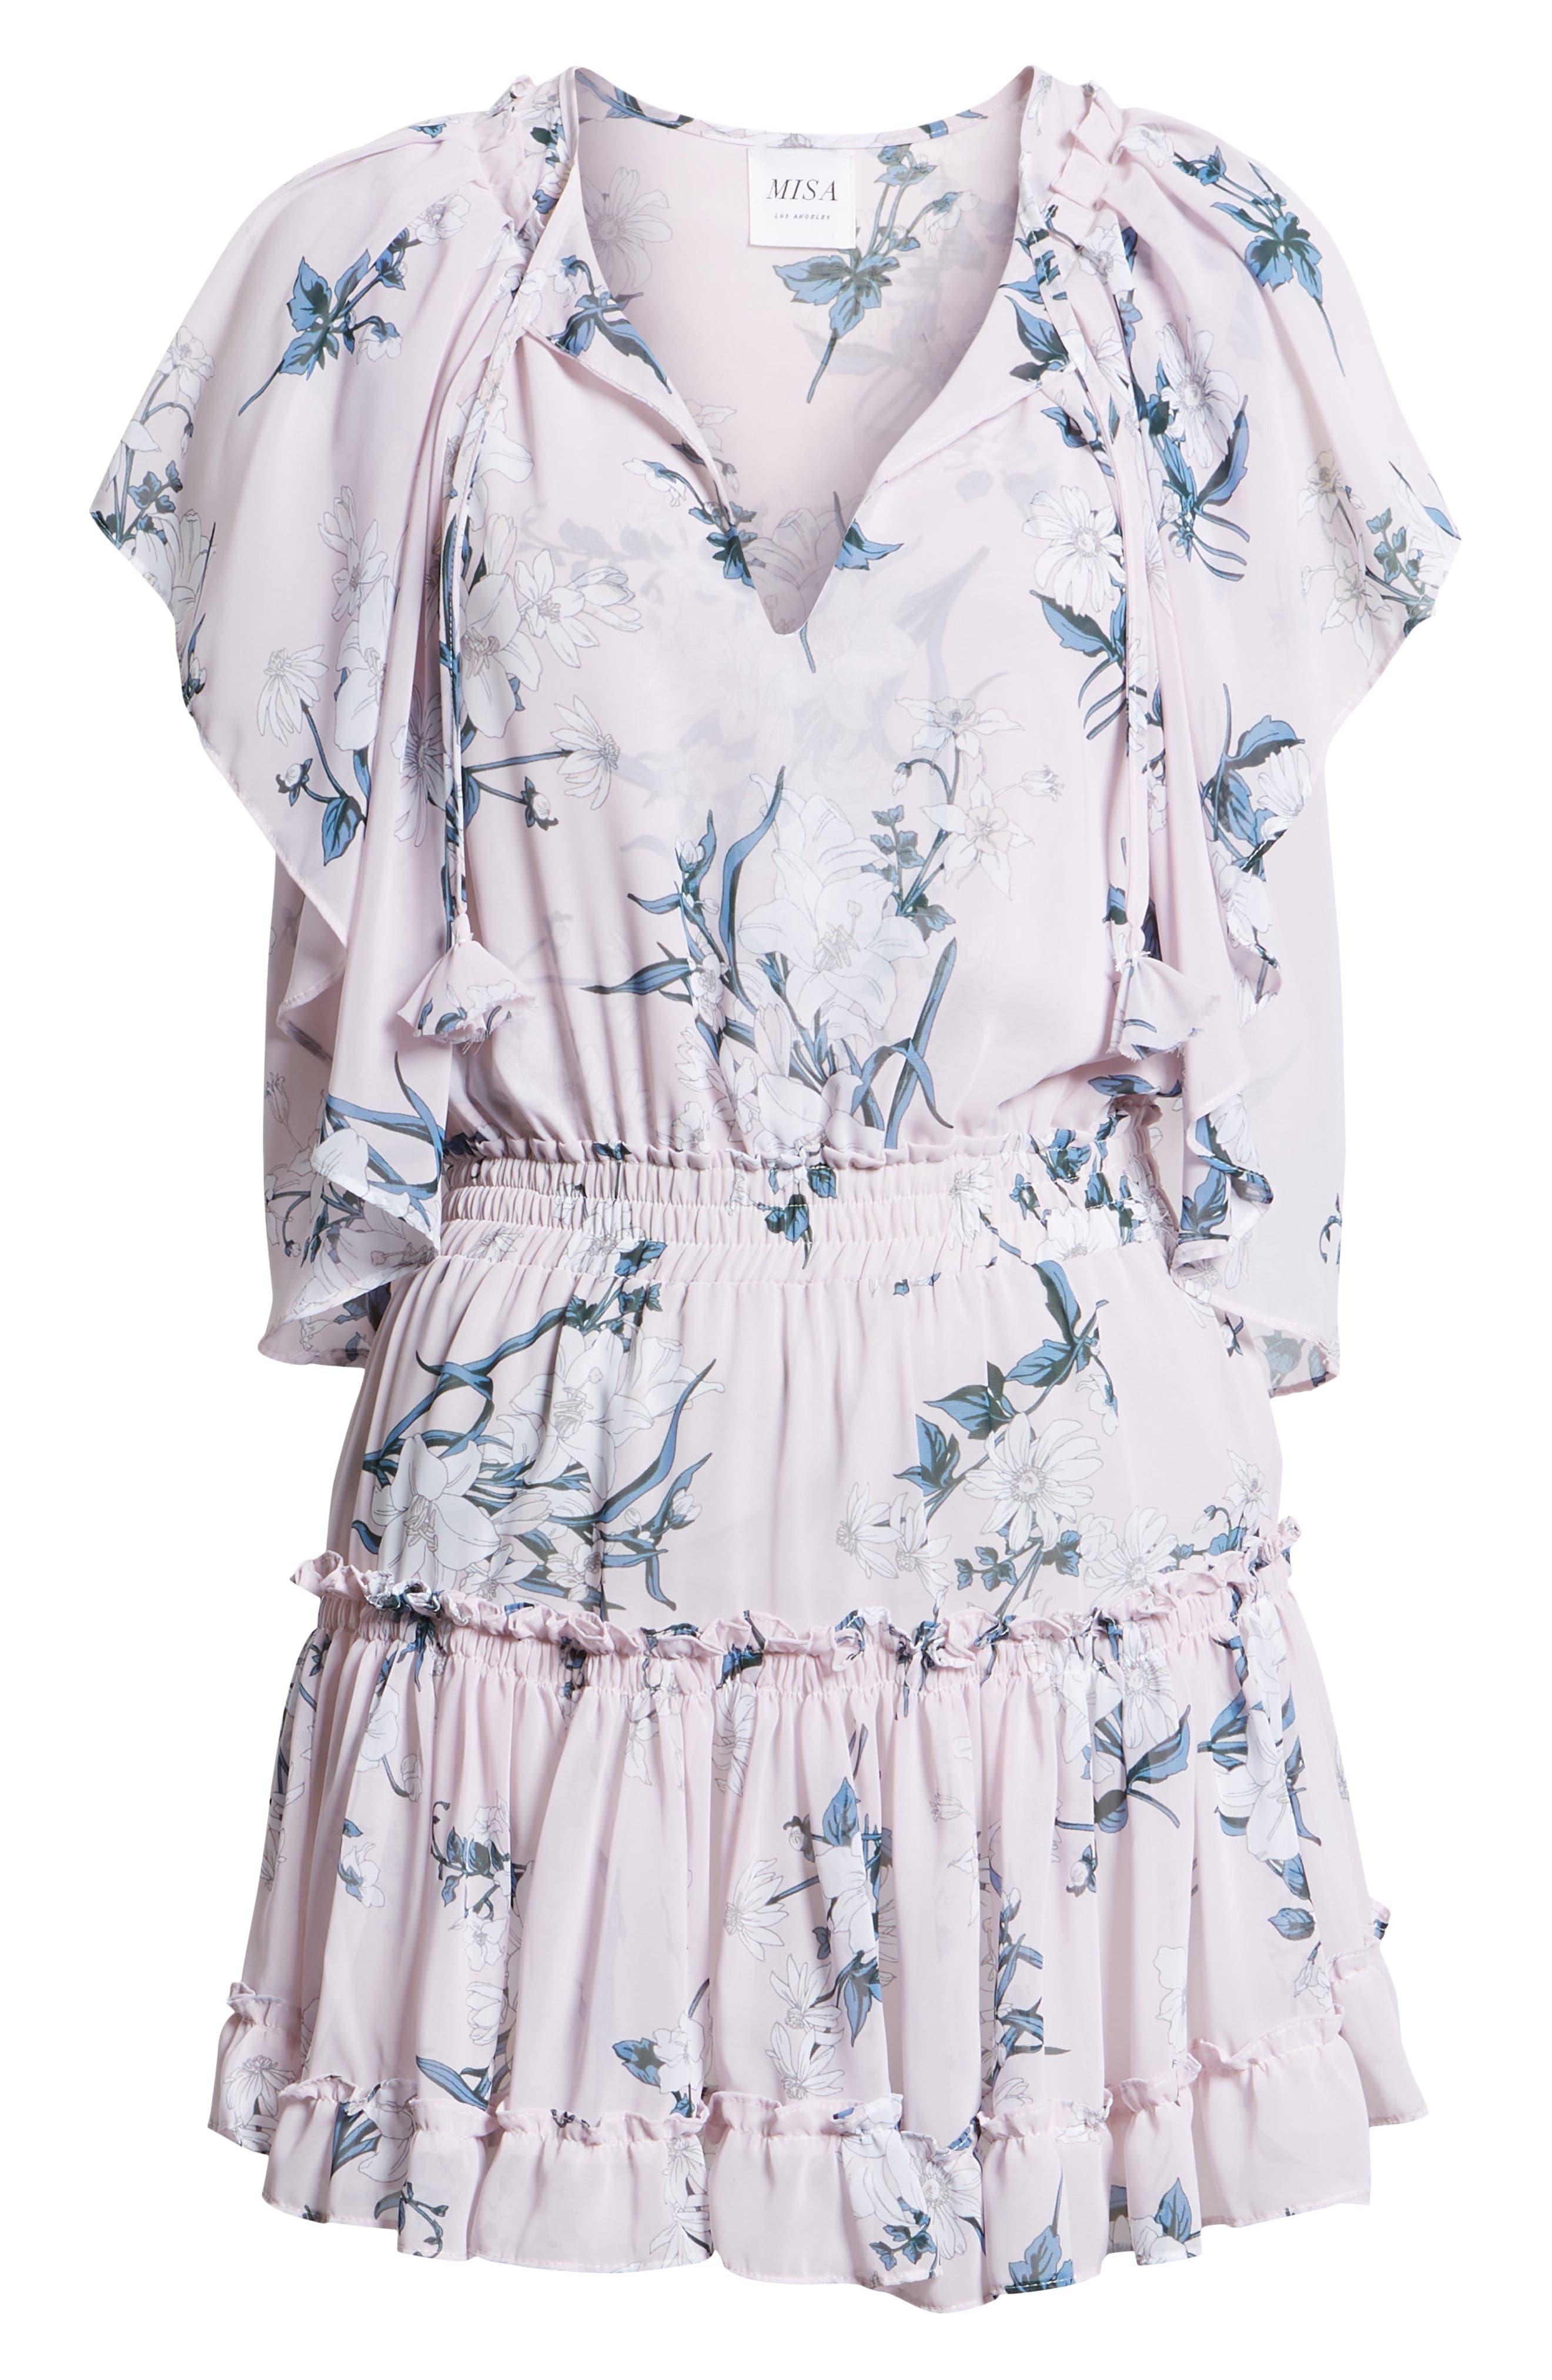 Lullu Dress,                             Alternate thumbnail 7, color,                             Multi Fe15